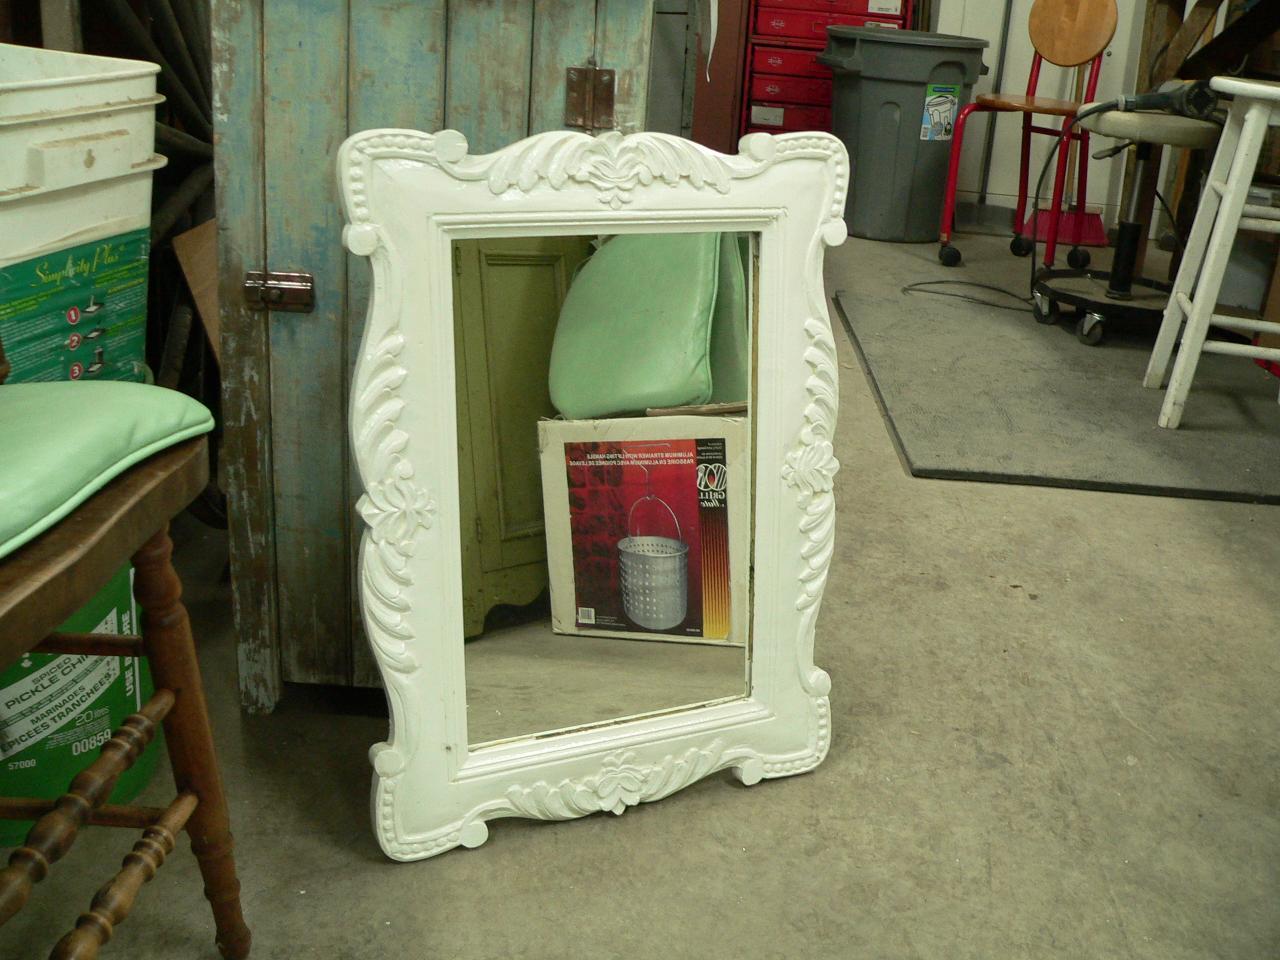 Miroir antique # 3302